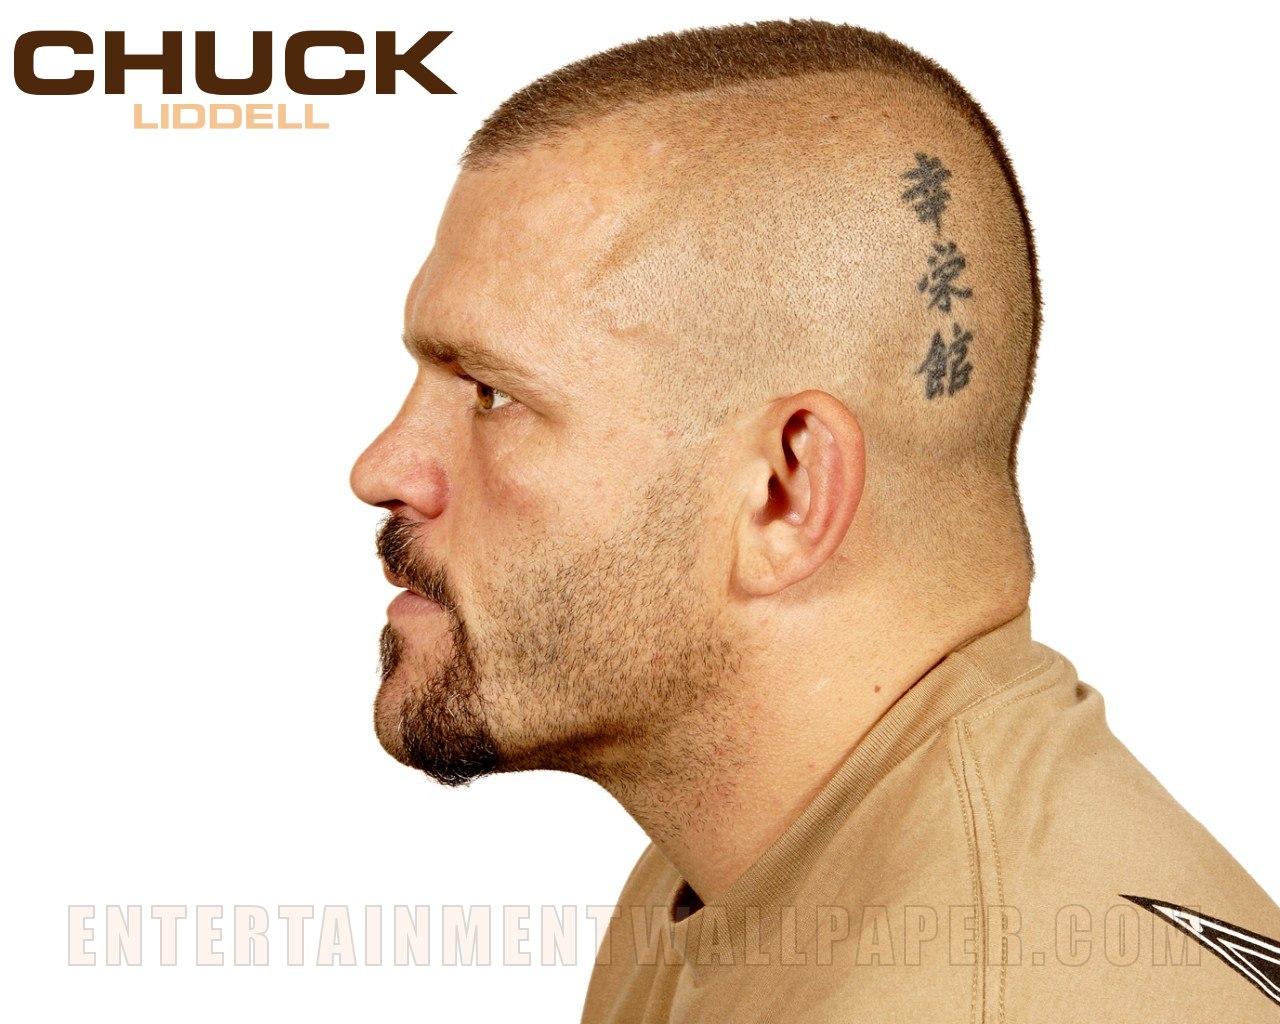 Chuck Liddell Haircut Called The Best Haircut Of 2018